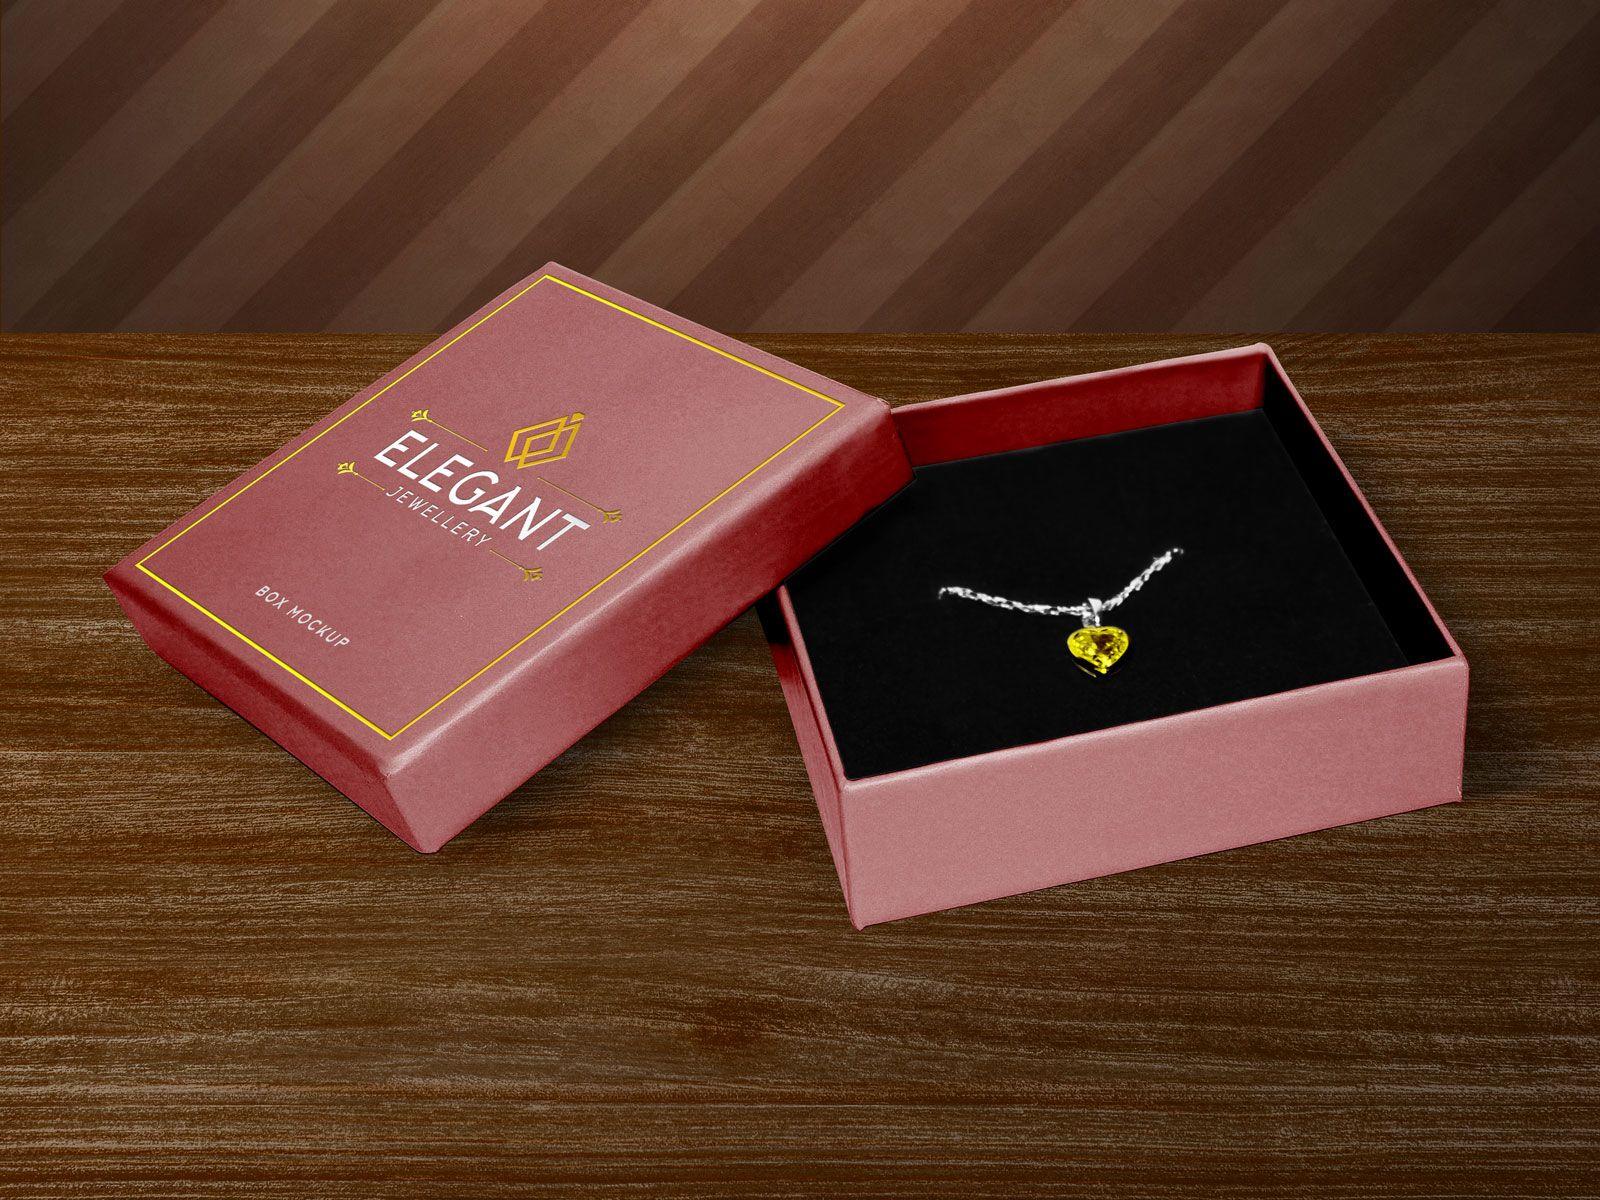 Download Free Jewellery Box Packaging Mockup Psd Packaging Mockup Small Jewelry Box Box Packaging